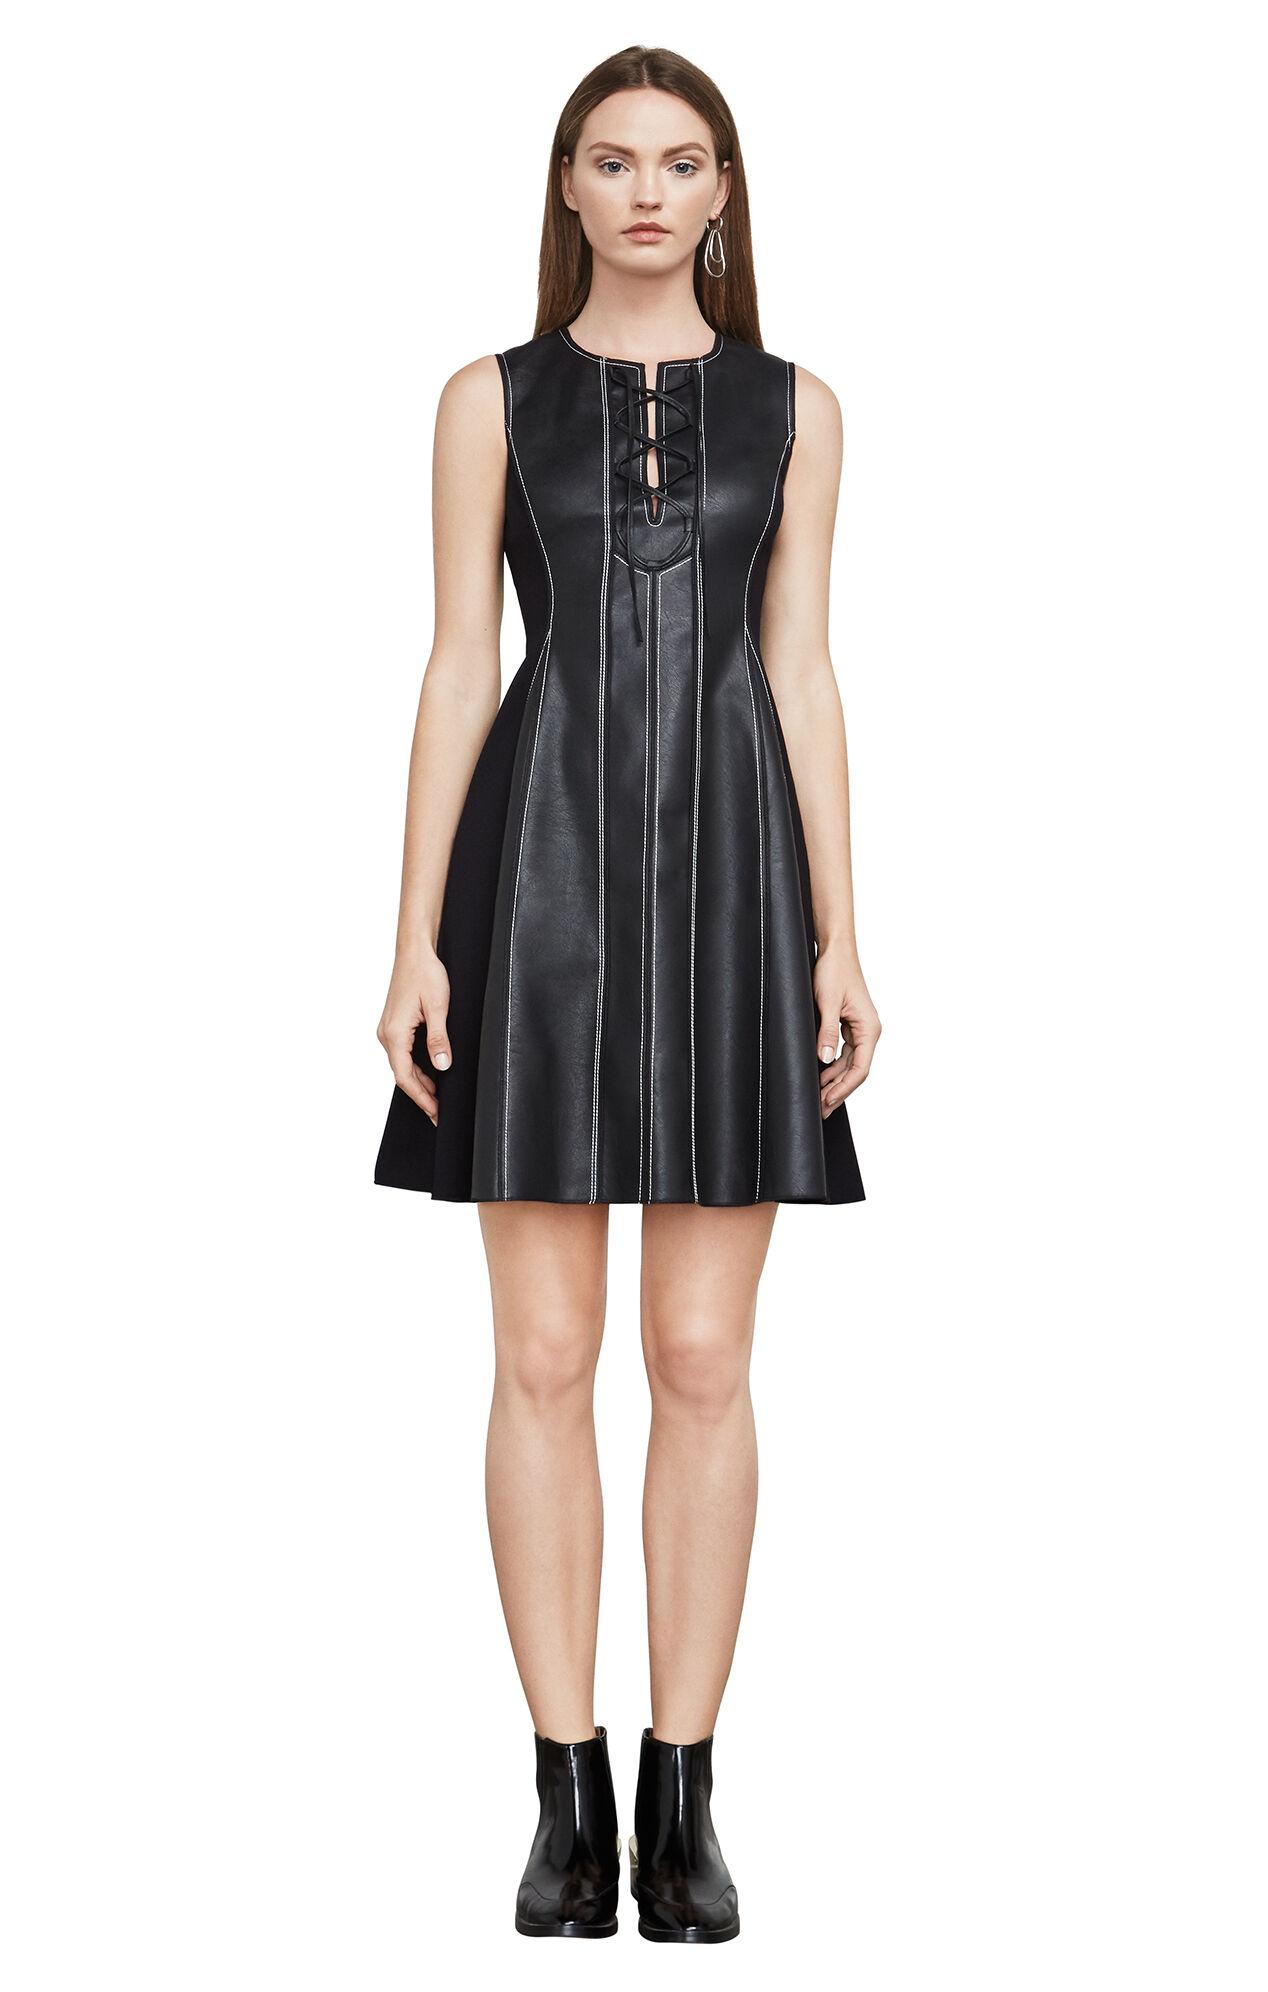 Black dress yellow sash - Jolee Sleeveless Faux Leather Dress